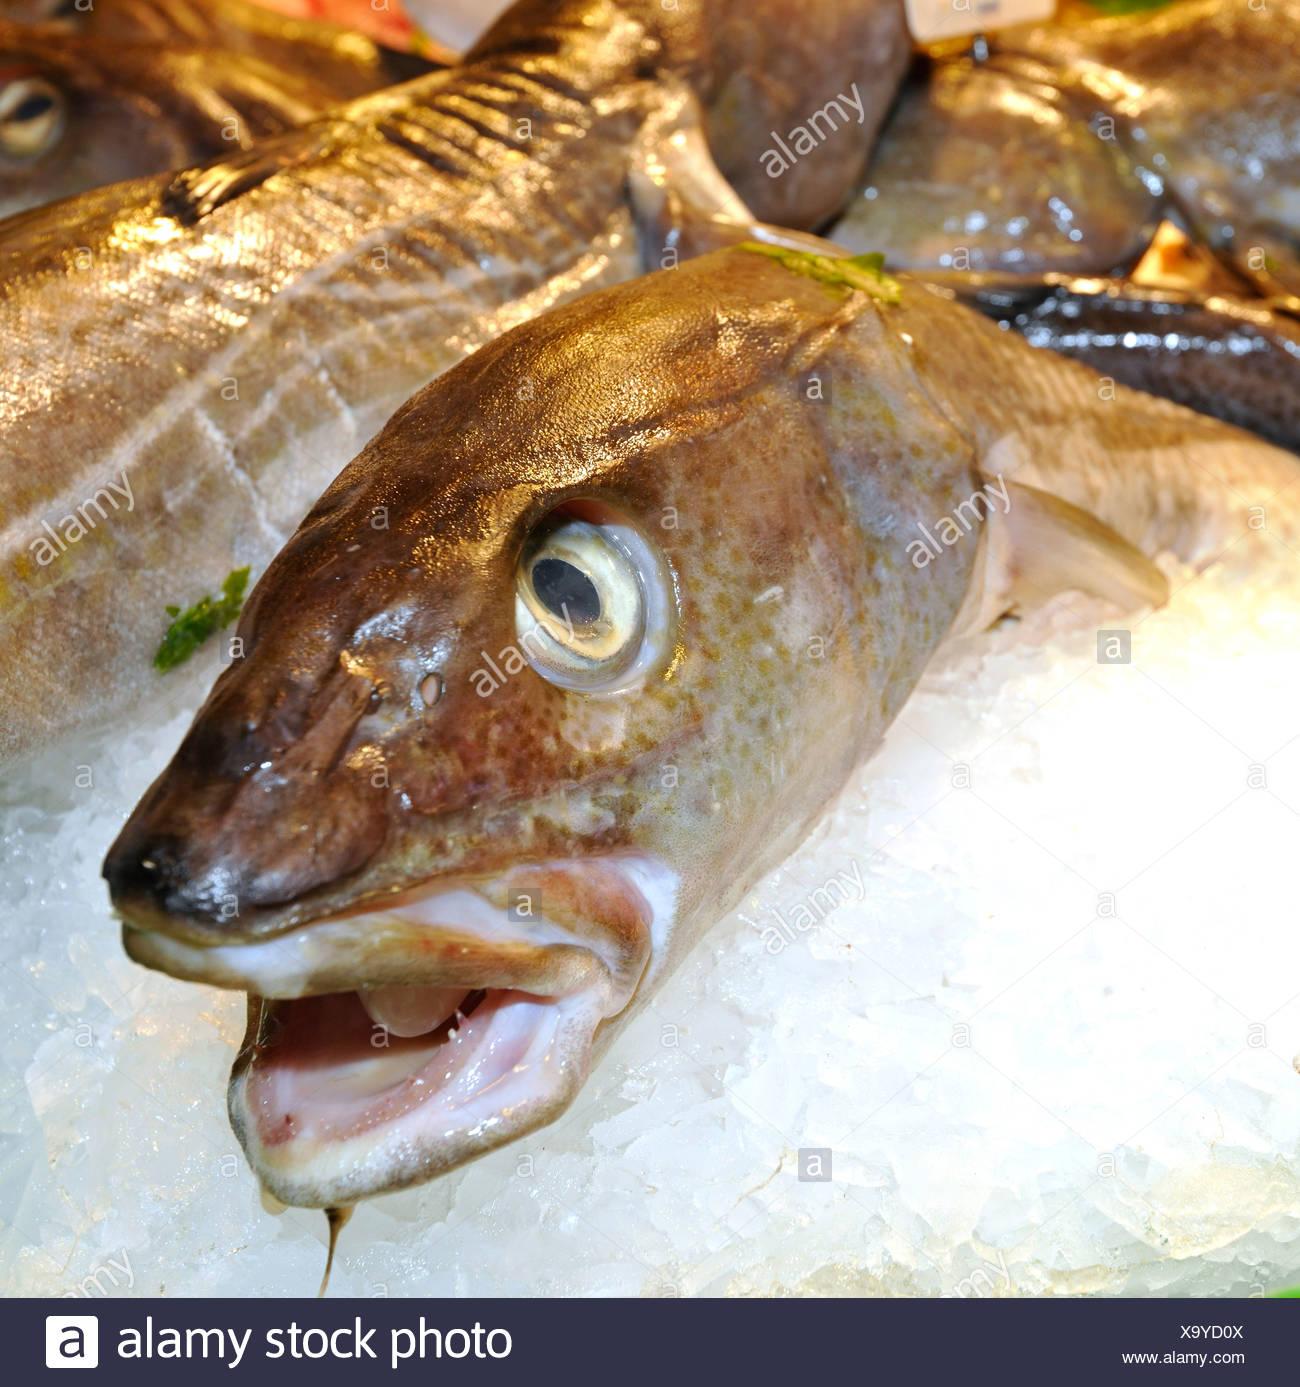 Various fresh fish, market halls, Mercat de la Boqueria, Barcelona, Las Ramblas, Catalunya, Spain, Europe - Stock Image